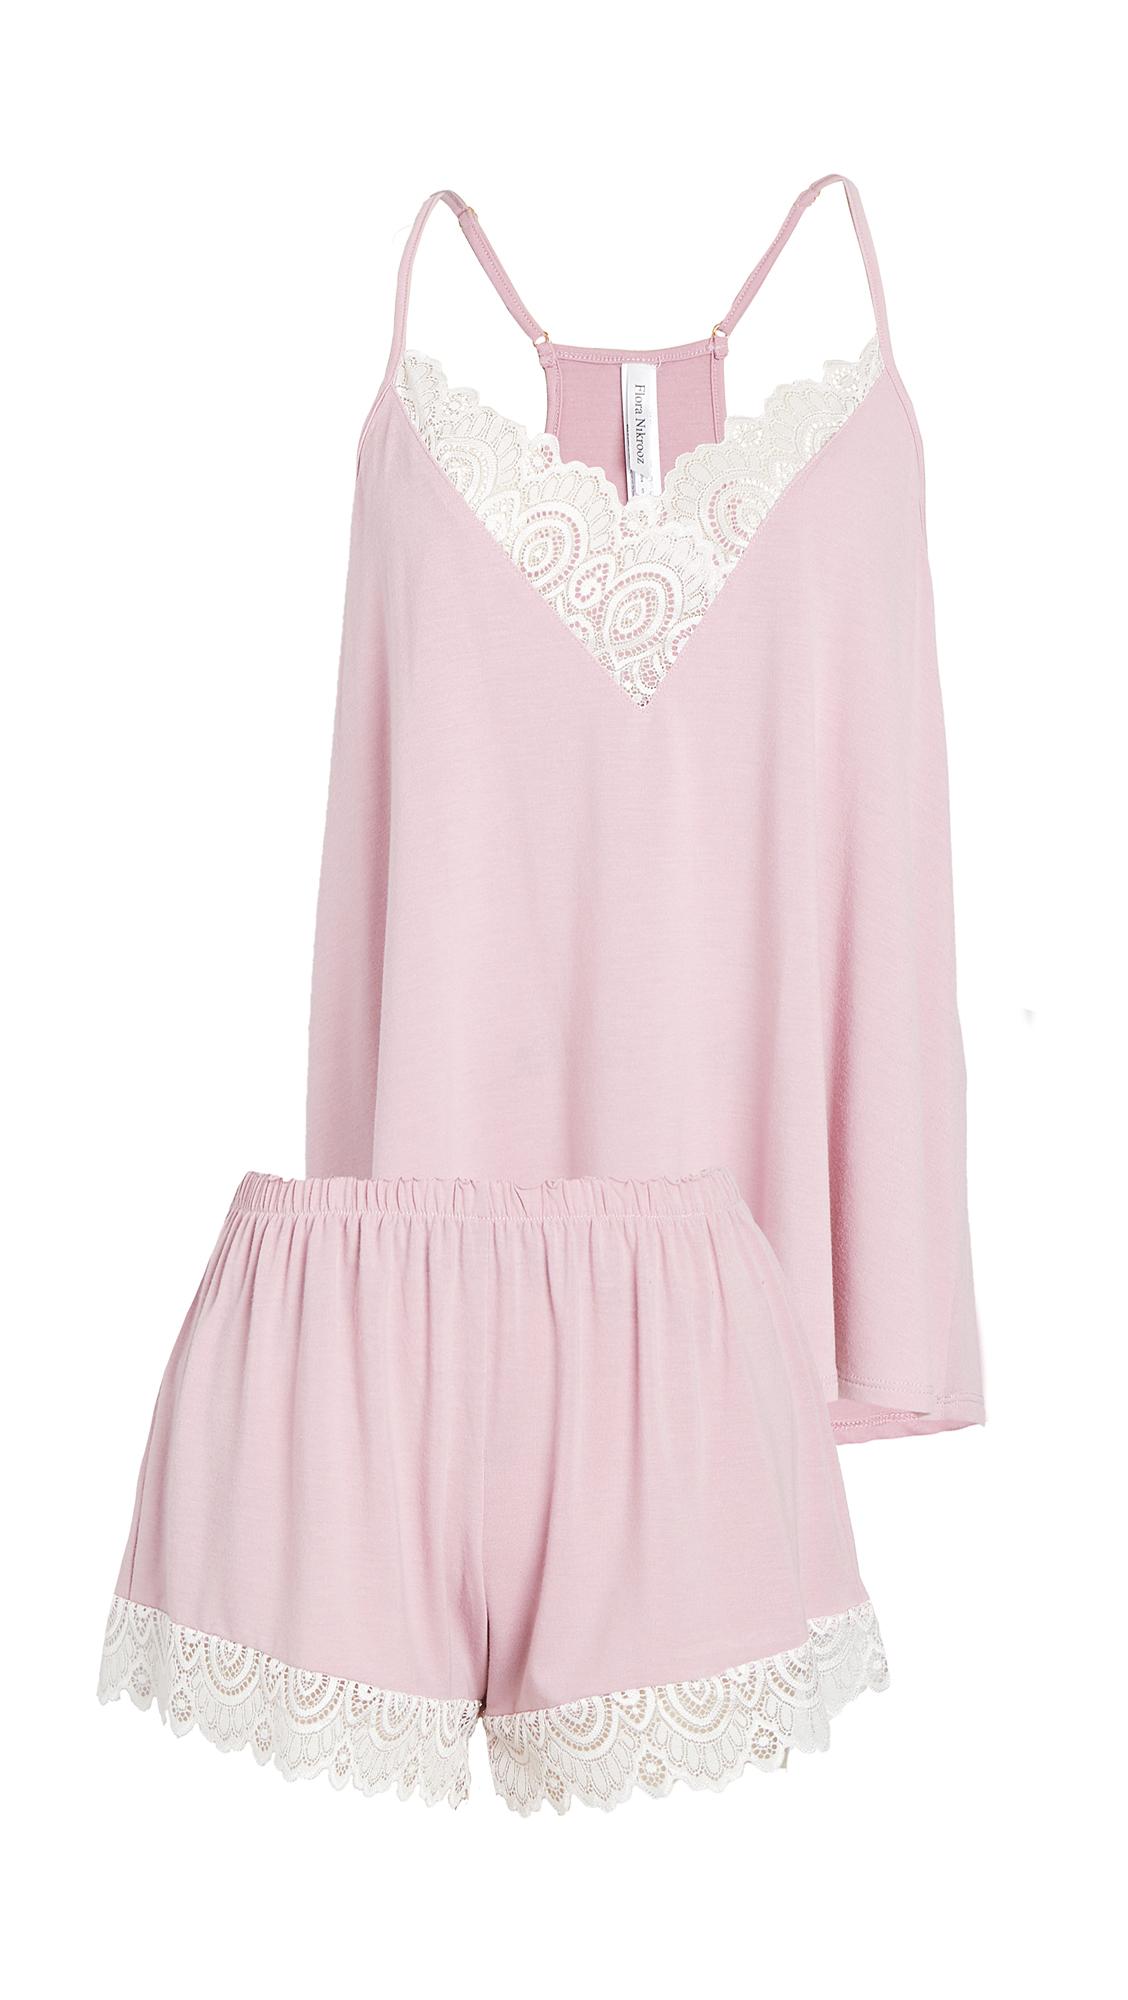 Flora Nikrooz Floretta II Knit Cami Pajama Set with Lace Trim